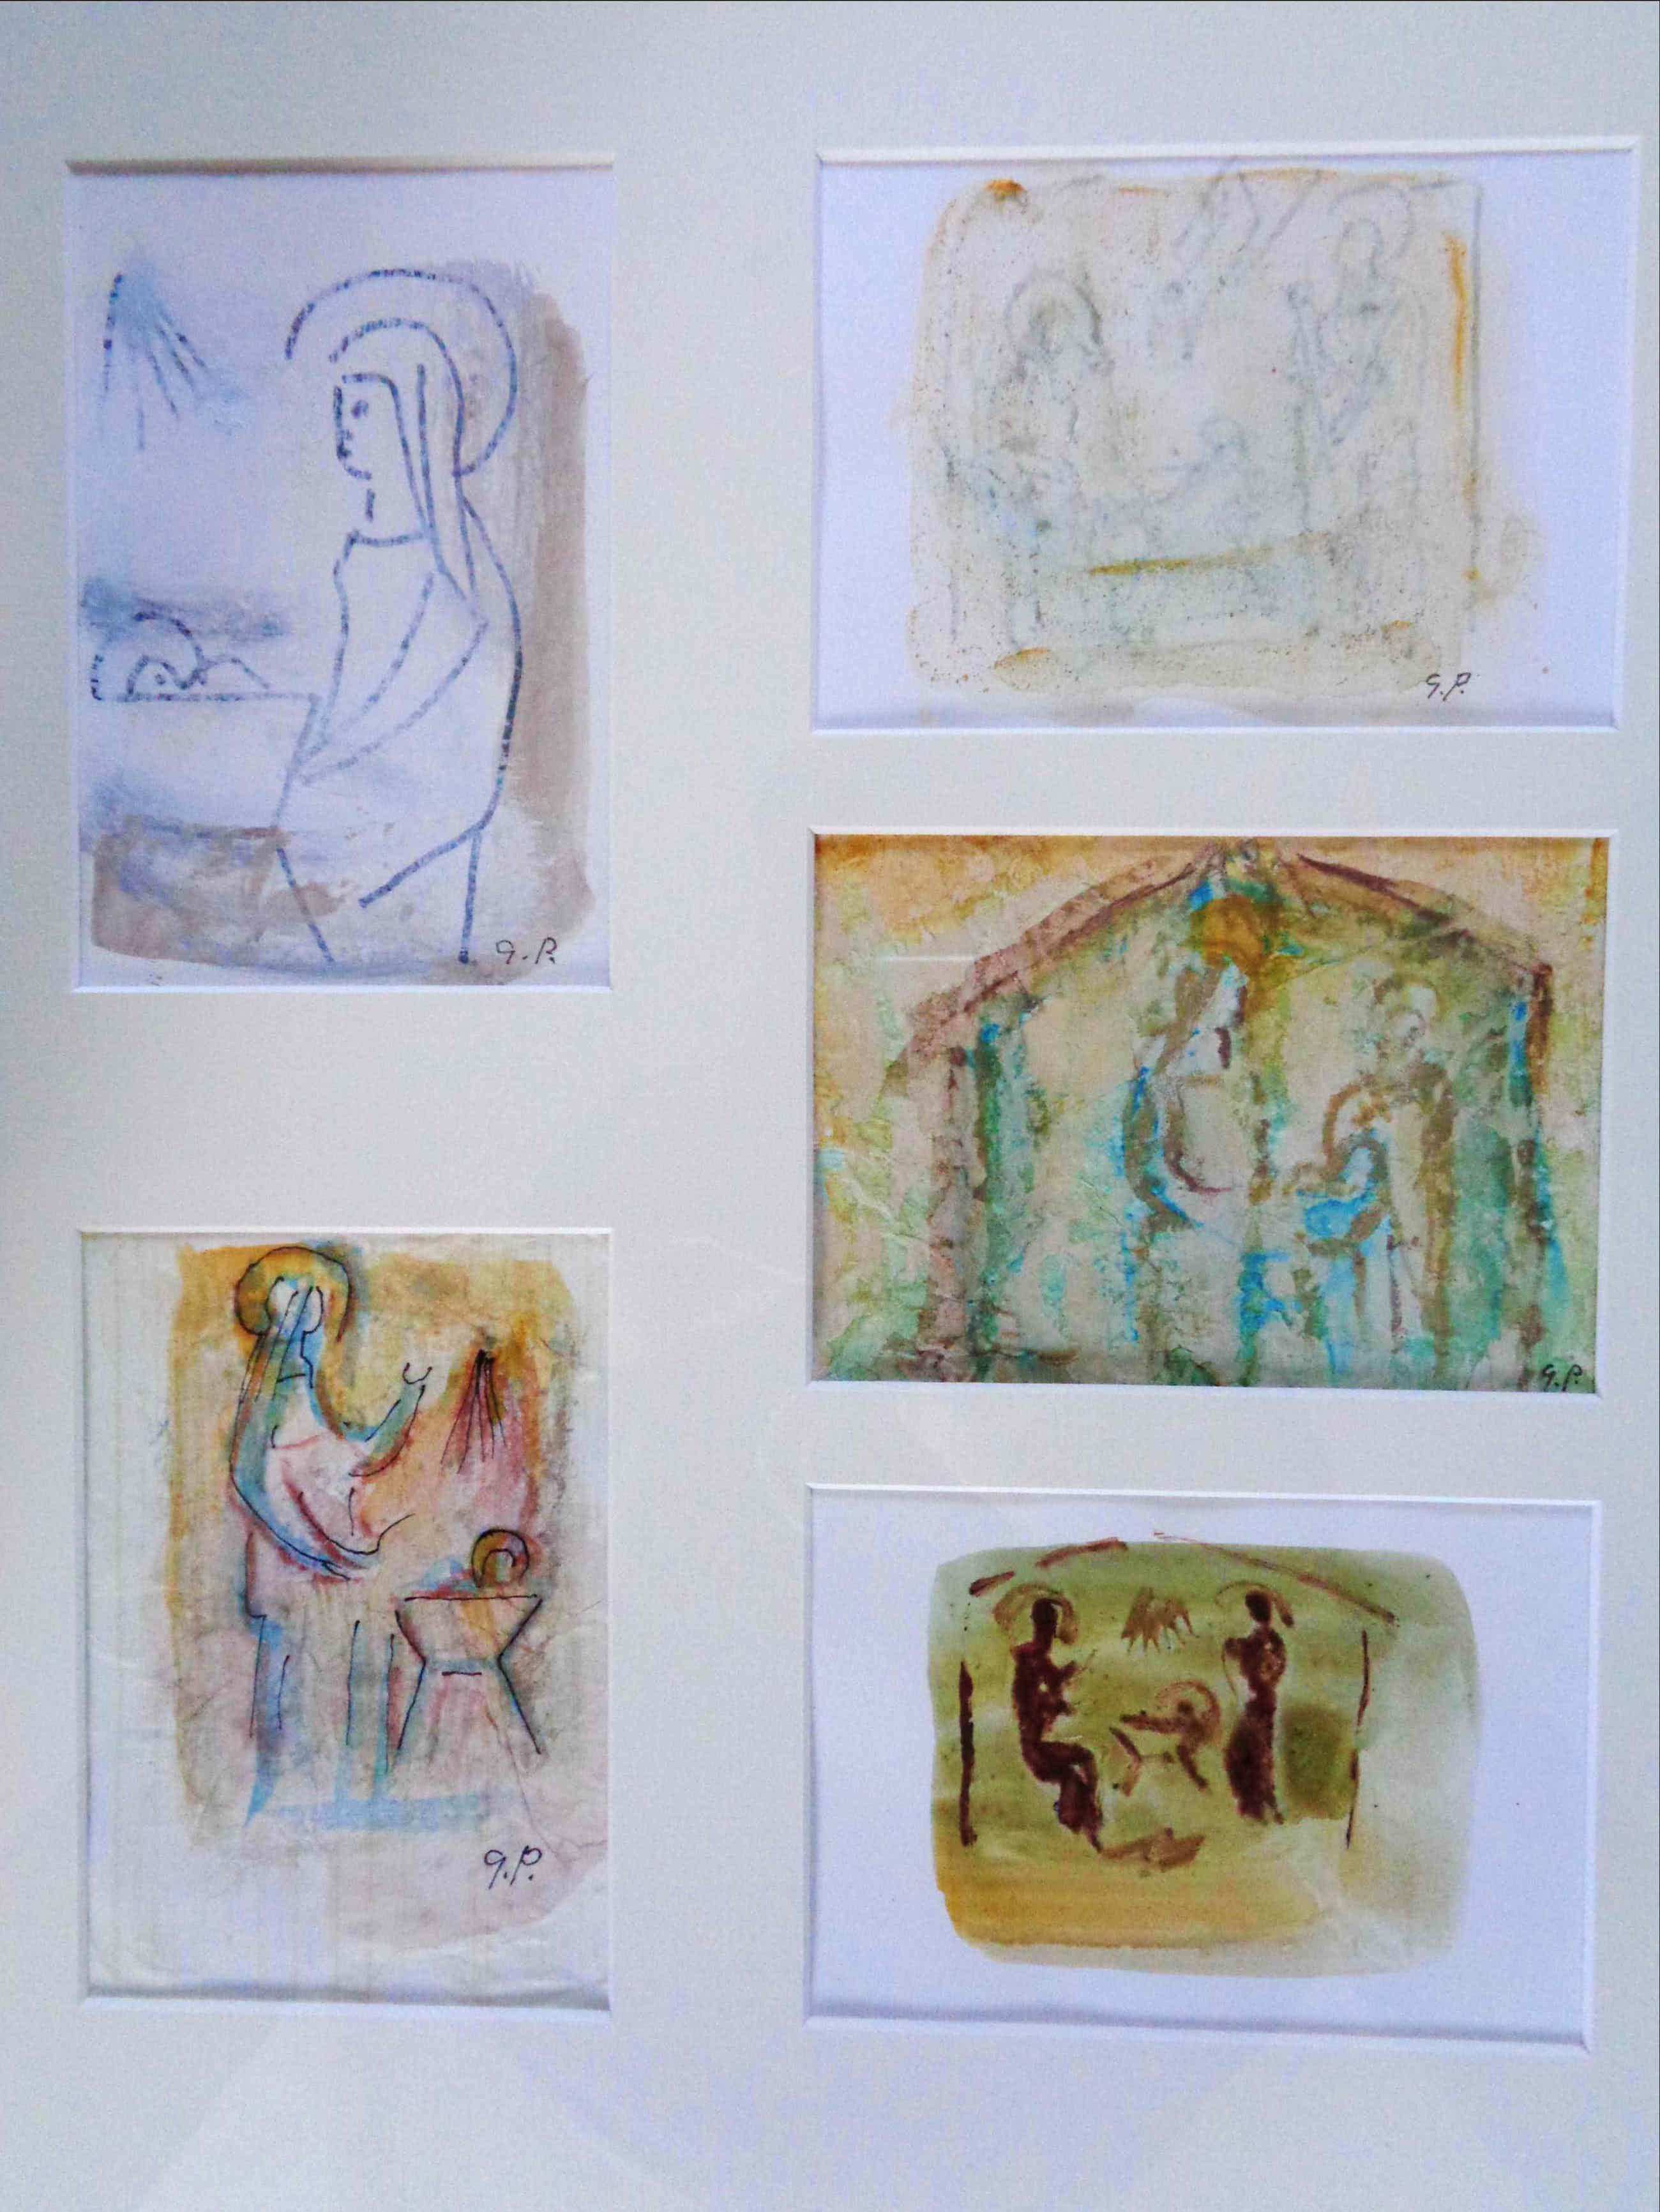 Gerard Princee - Geboorte van Jezus Christus , kerstkaart (5x) kopen? Bied vanaf 120!